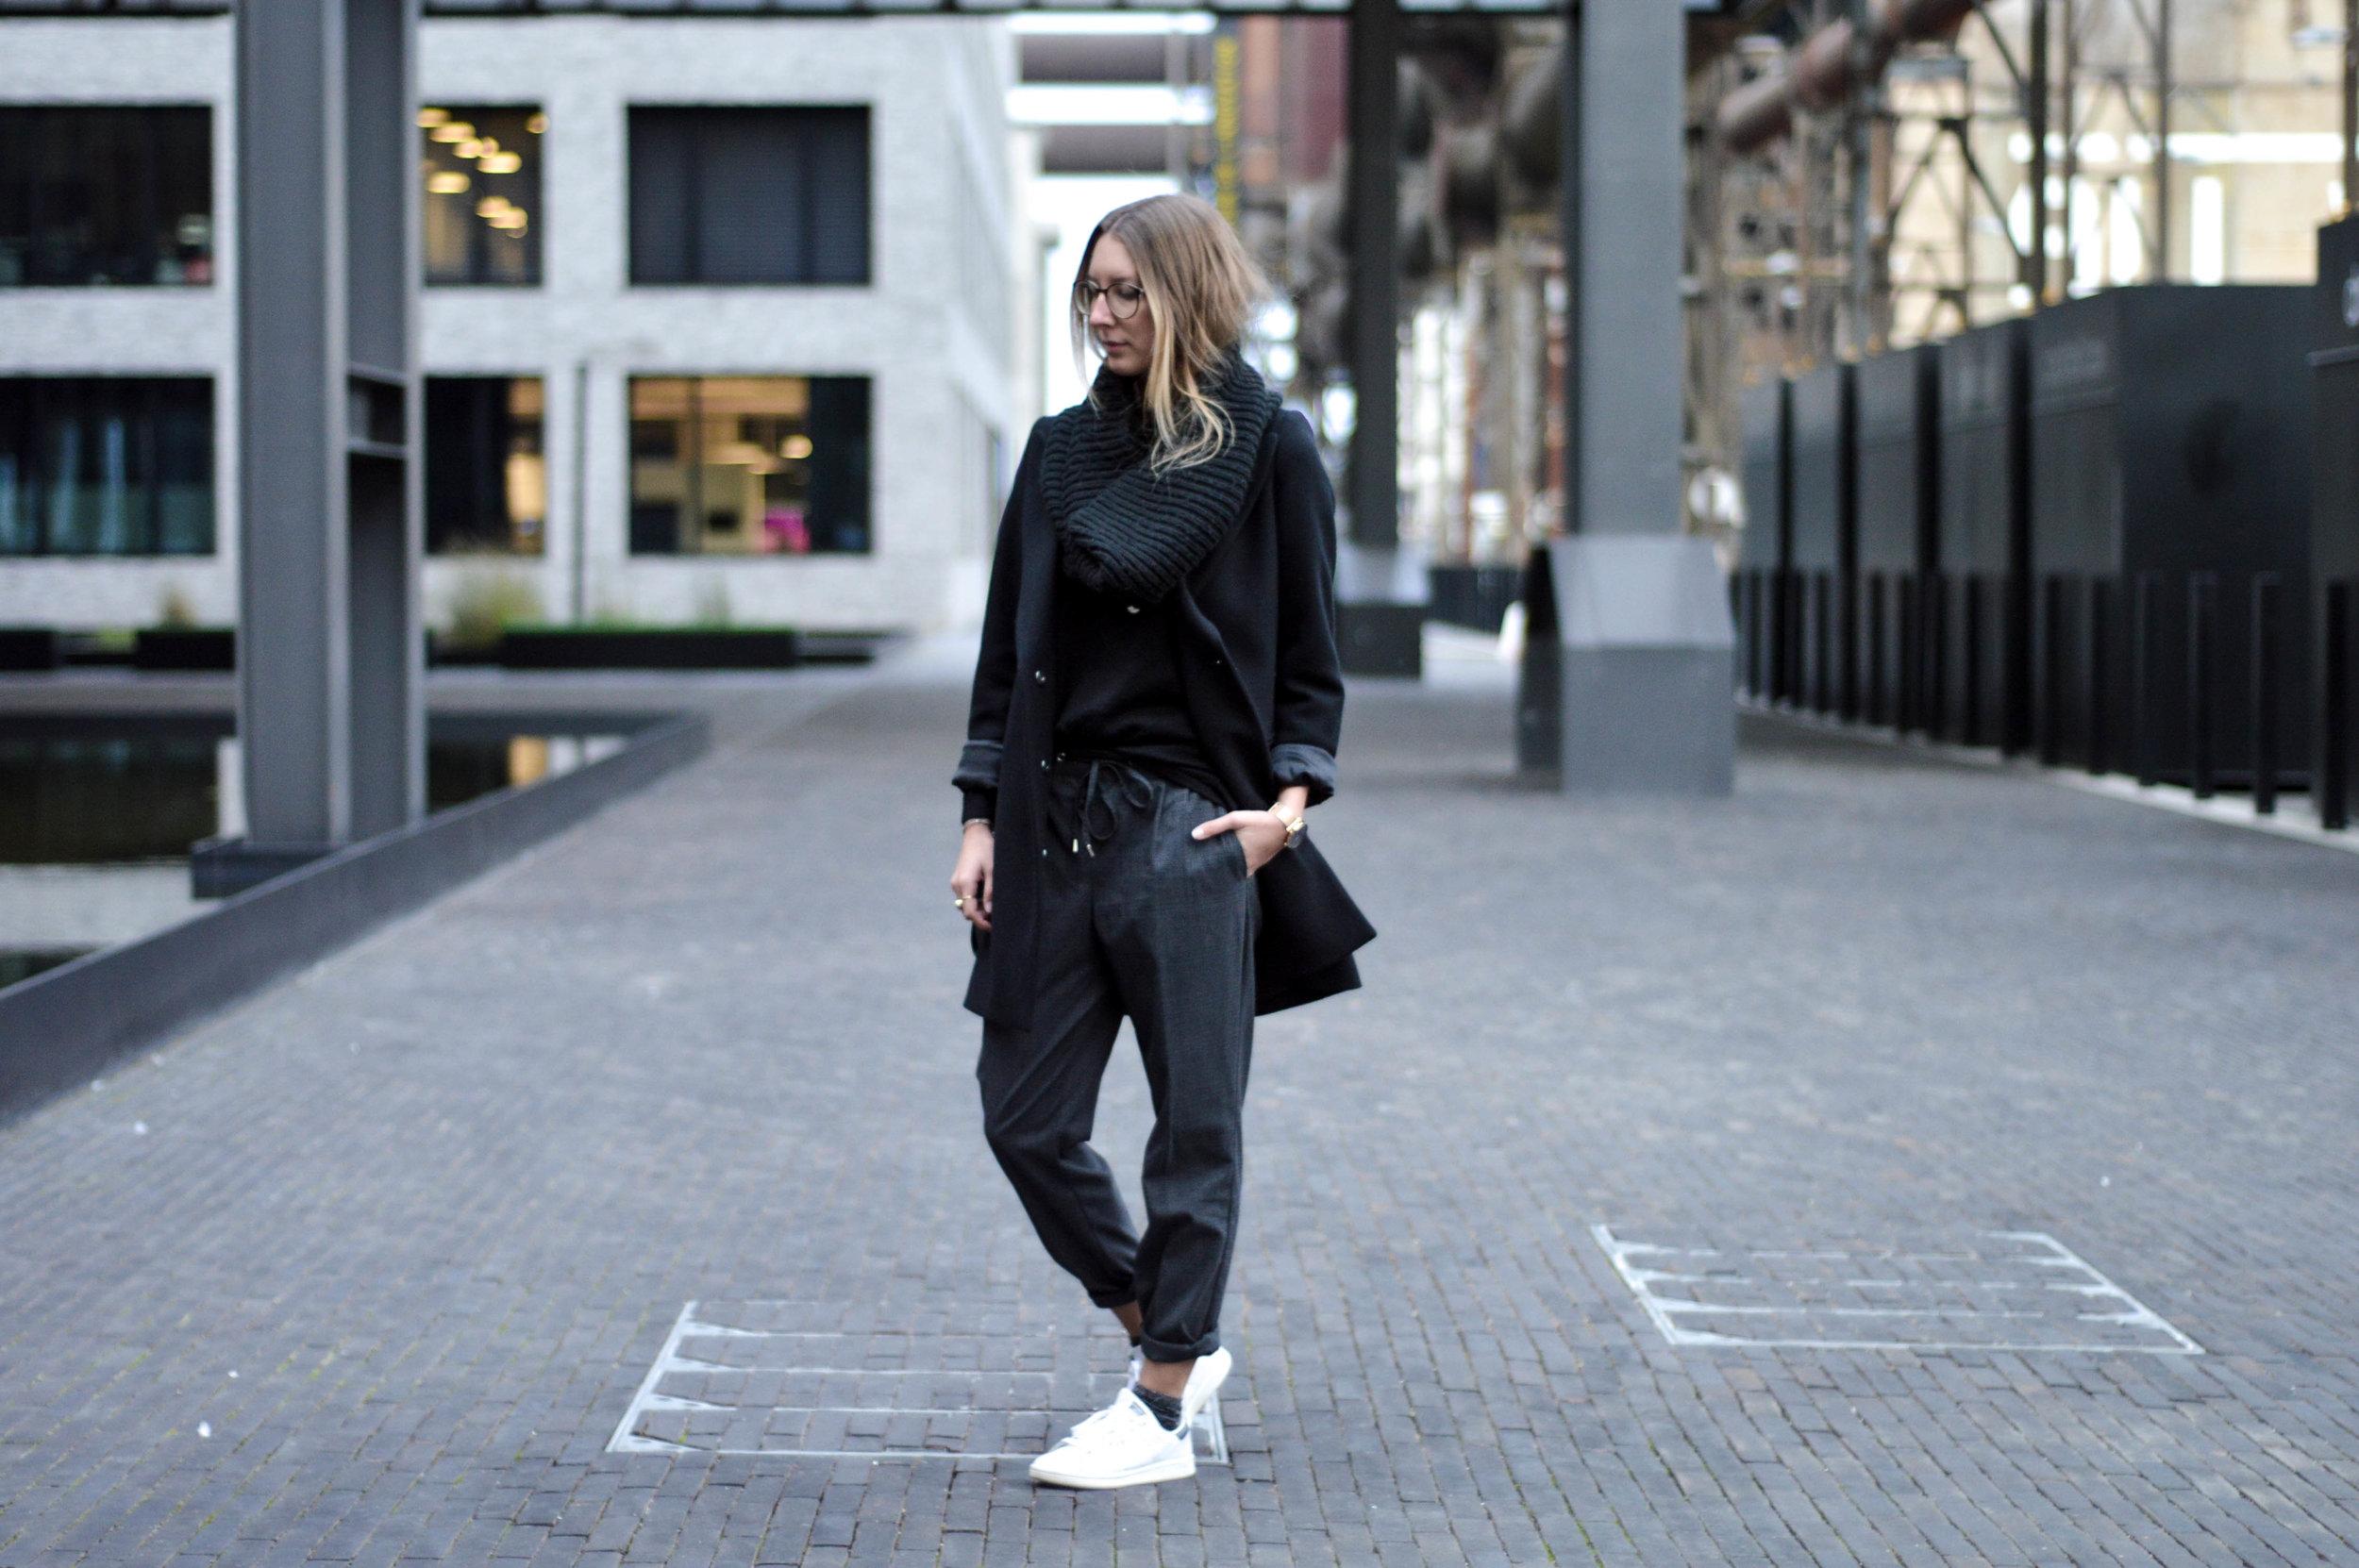 Winter Outfit - OSIARAH.COM (1 of 12).jpg